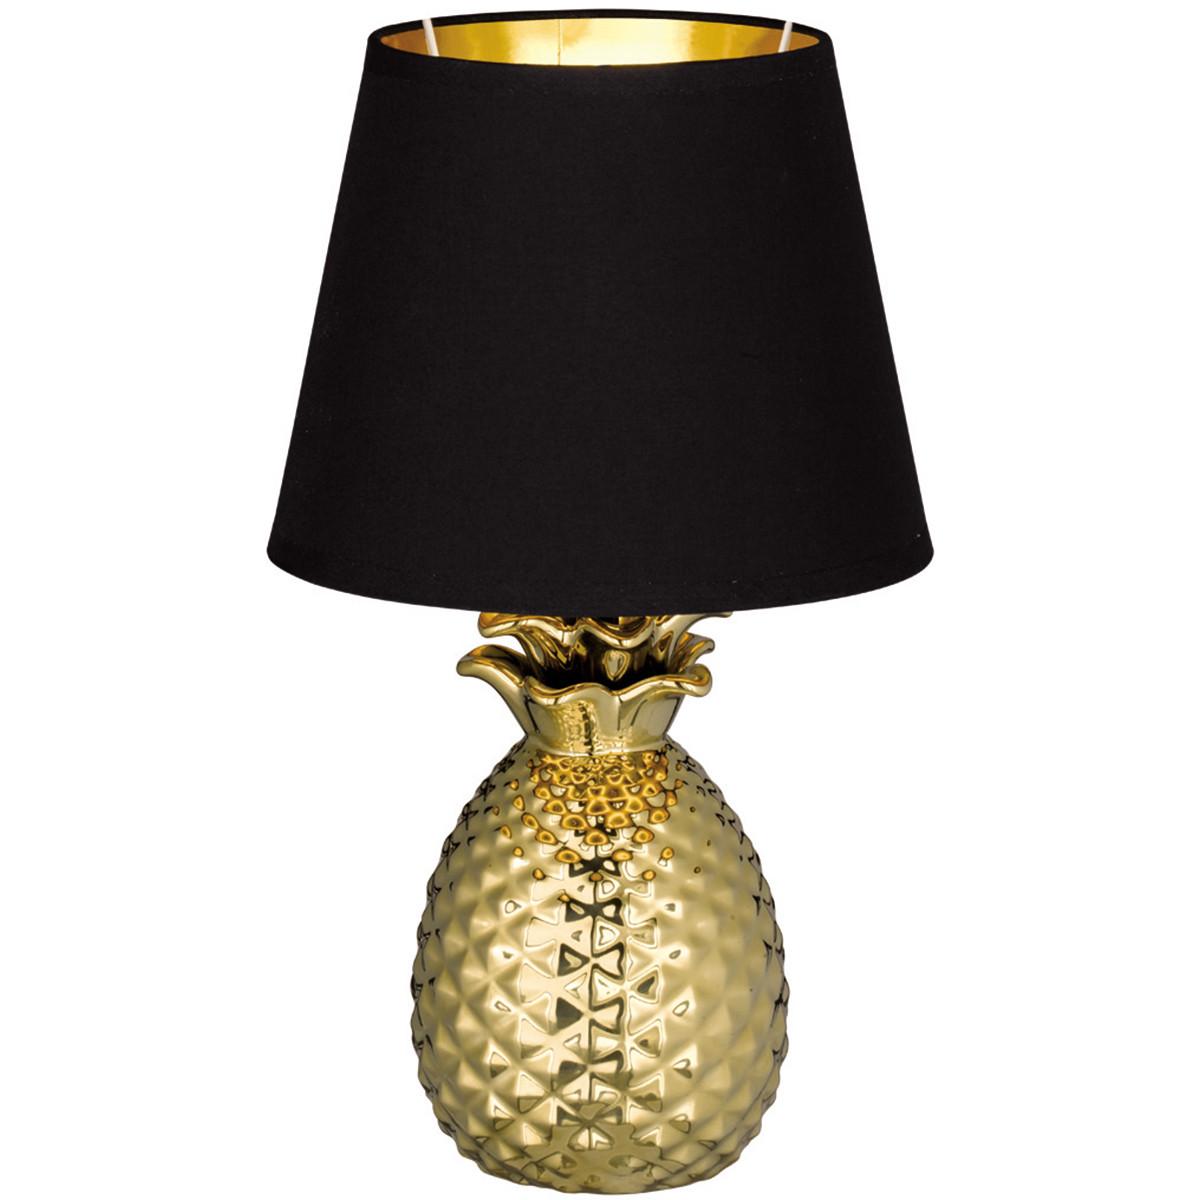 LED Tafellamp - Tafelverlichting - Trion Pinaply - E14 Fitting - Rond - Mat Goud - Keramiek